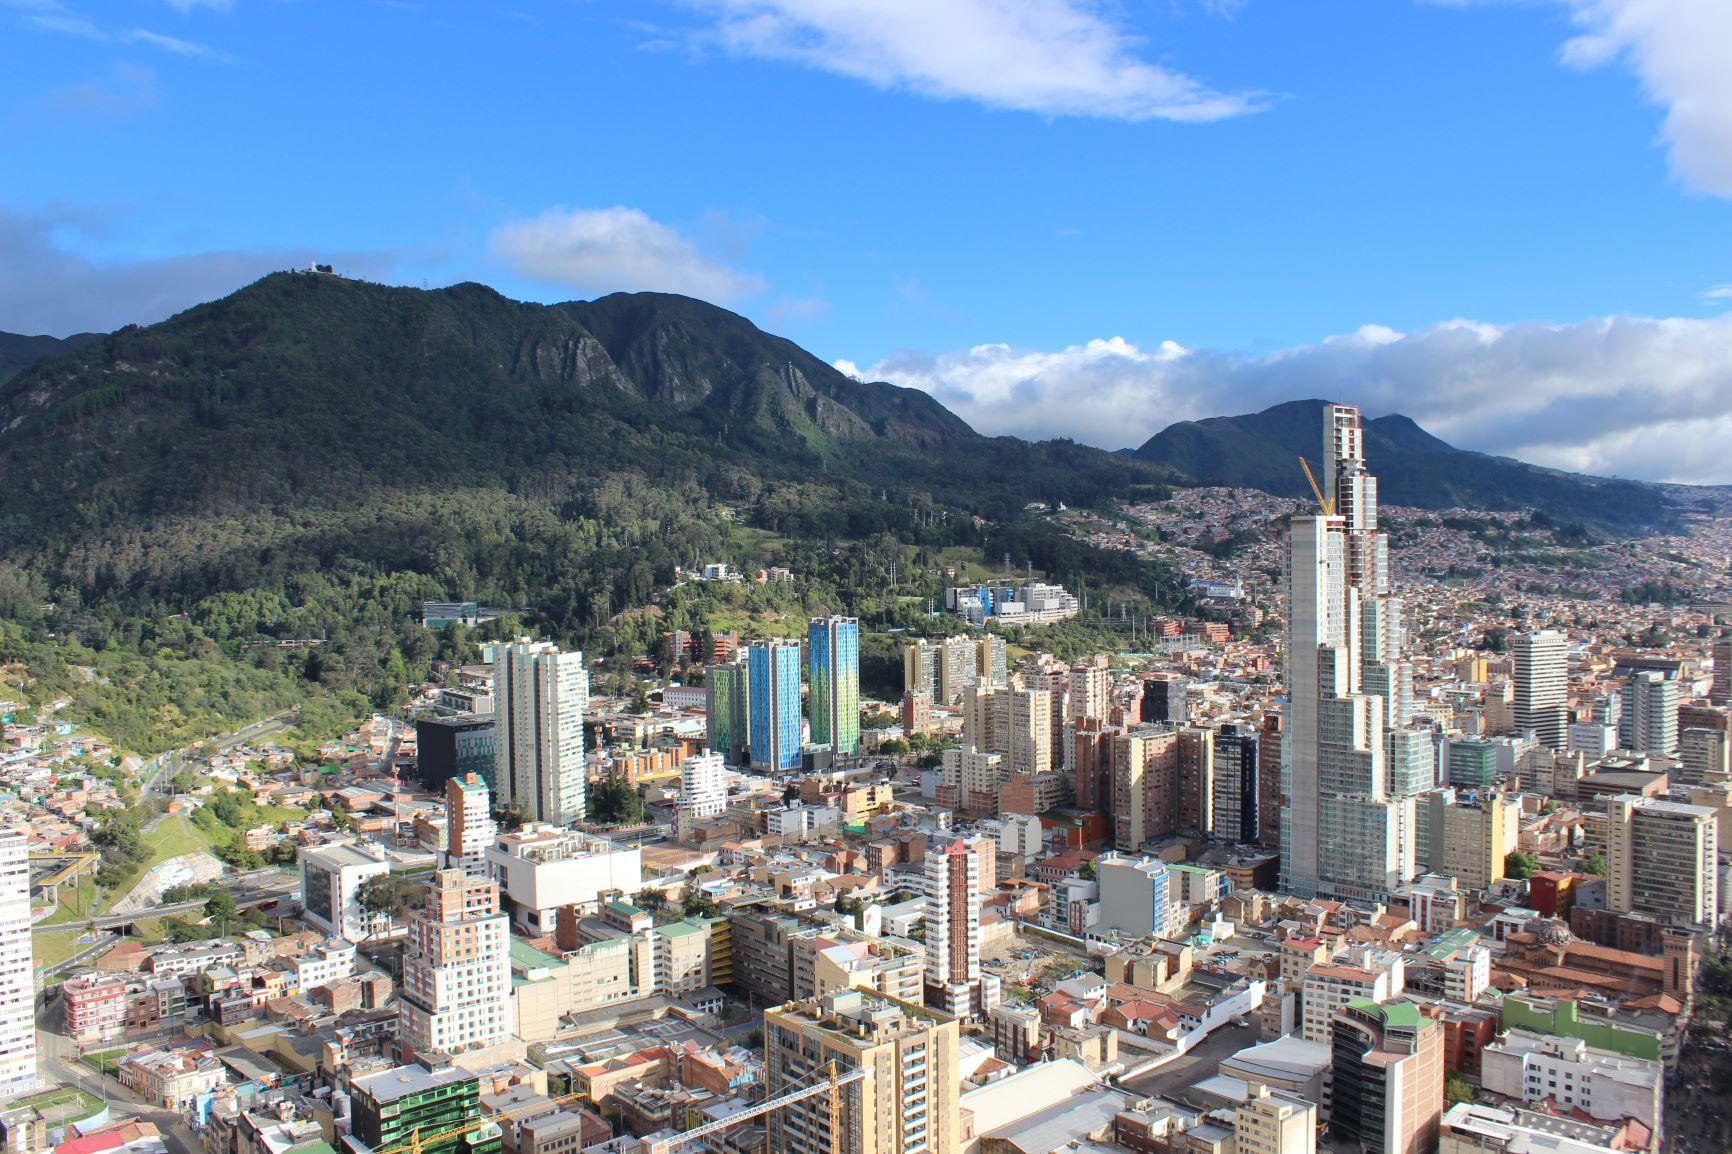 Image of Bogota Colombia